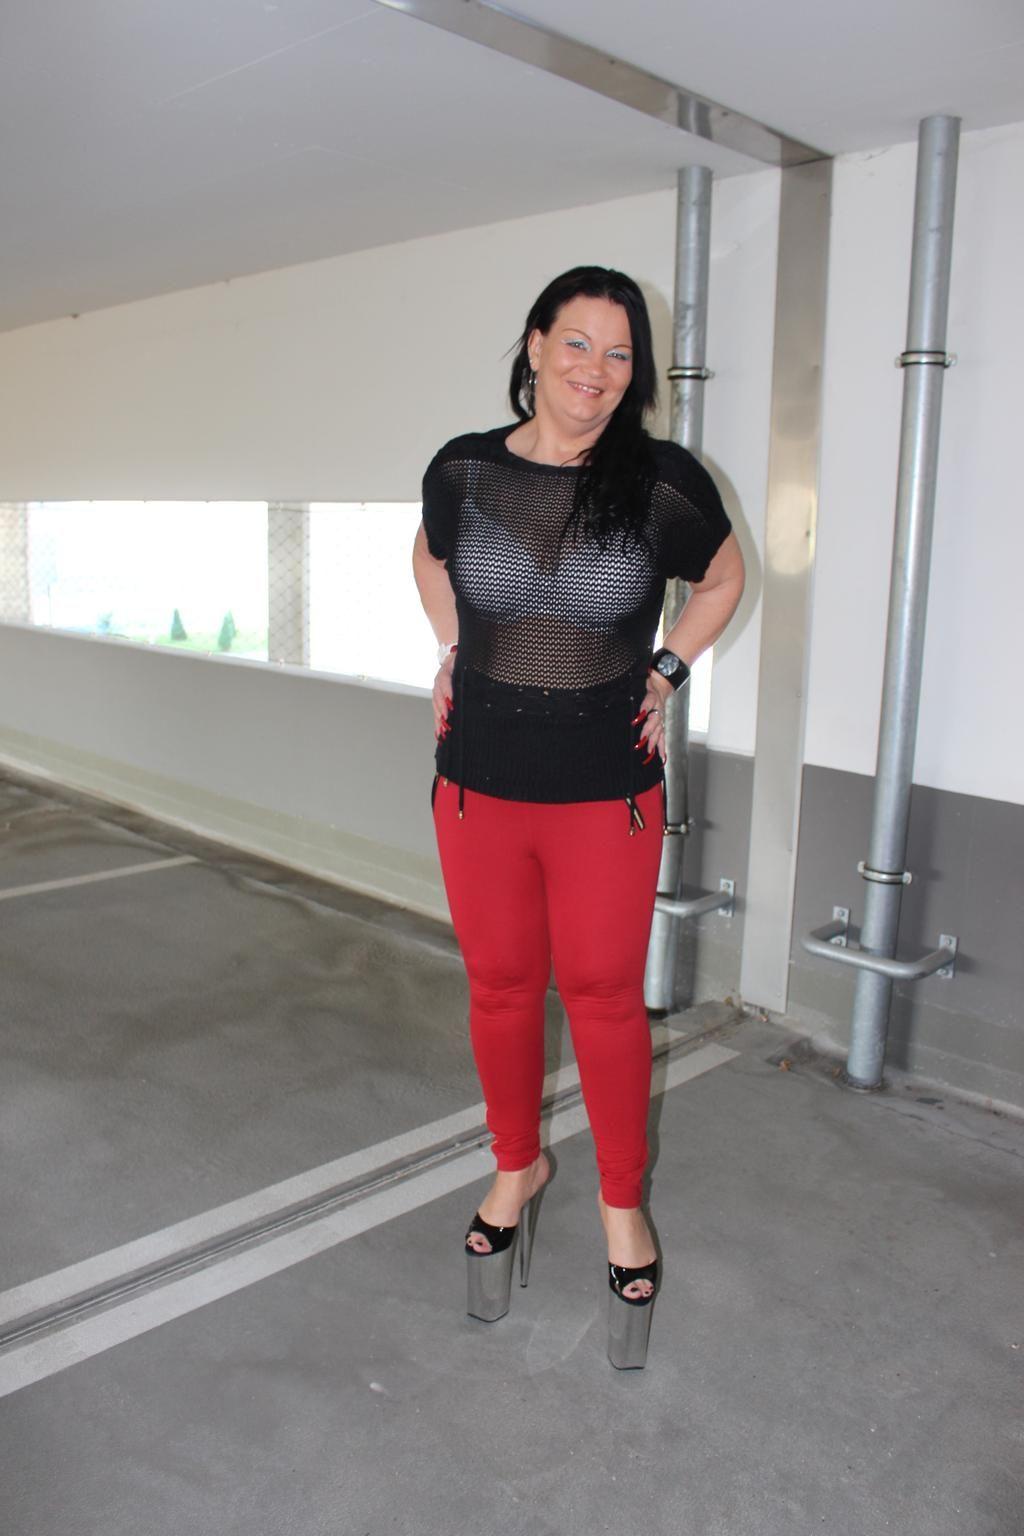 Gina Withe